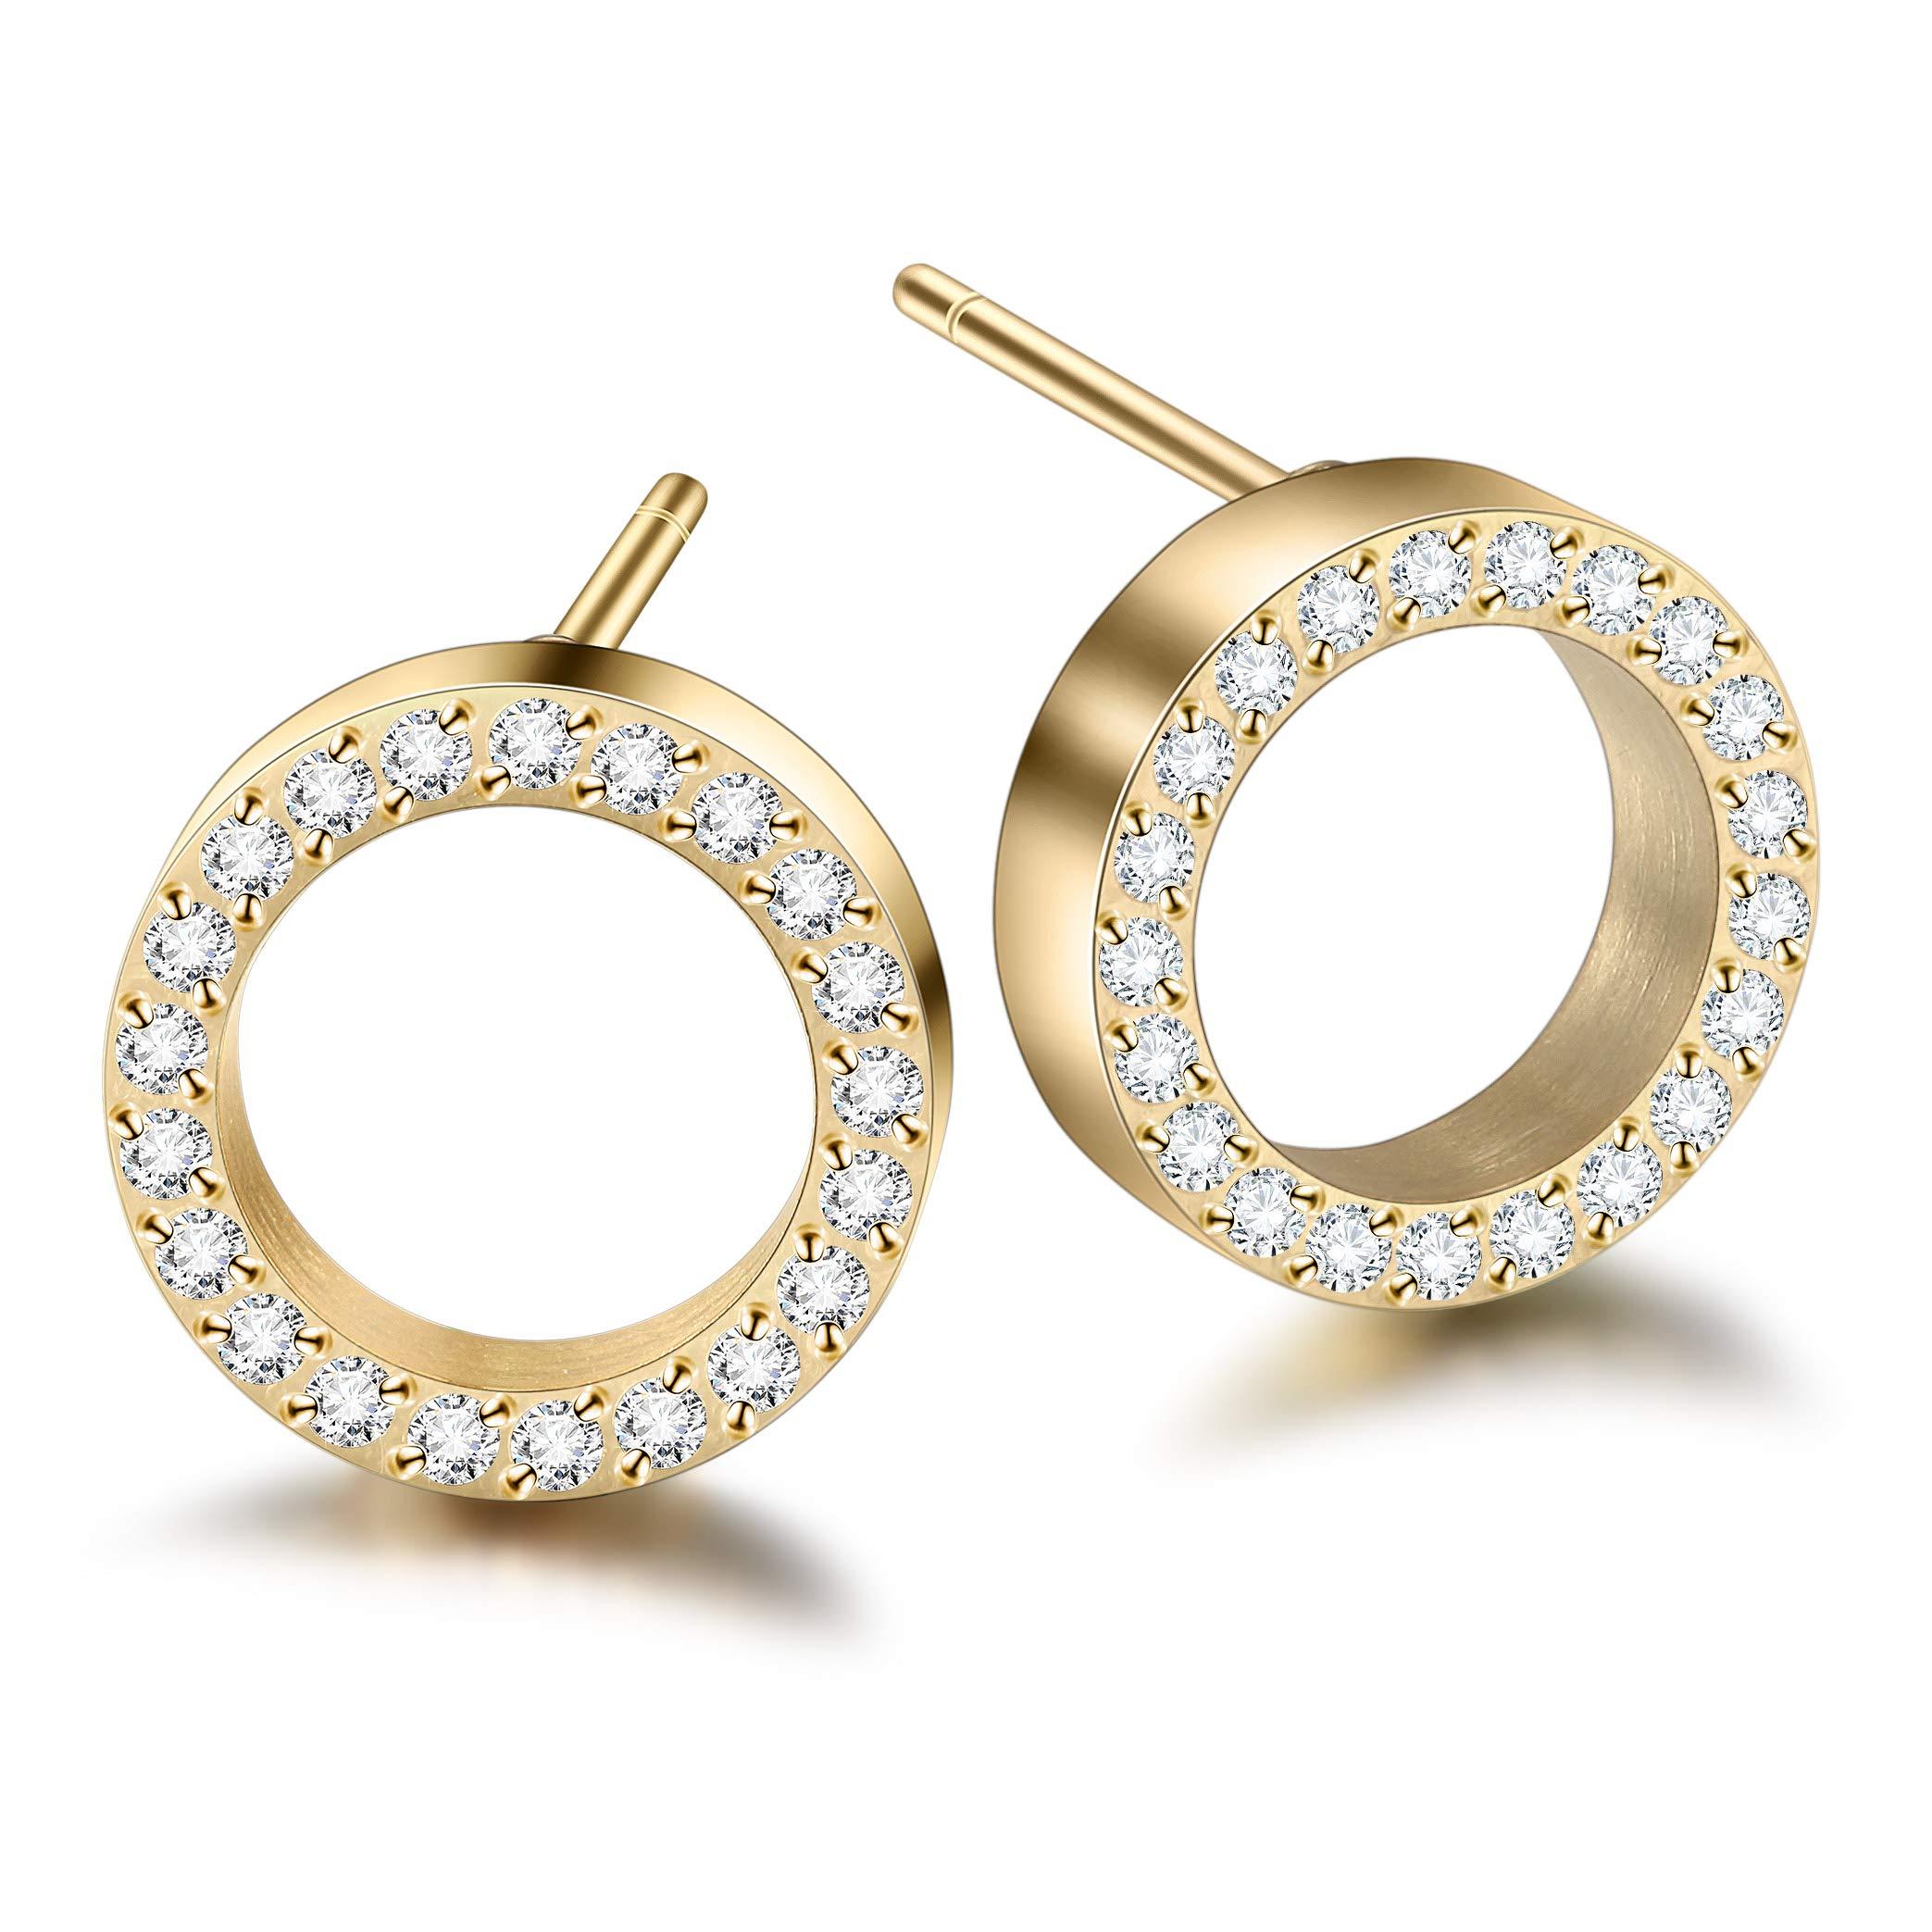 WISTIC Cubic Zirconia Earrings Stud Earrings Gold Plated for Women Men Girls Boys Gold Rose Gold